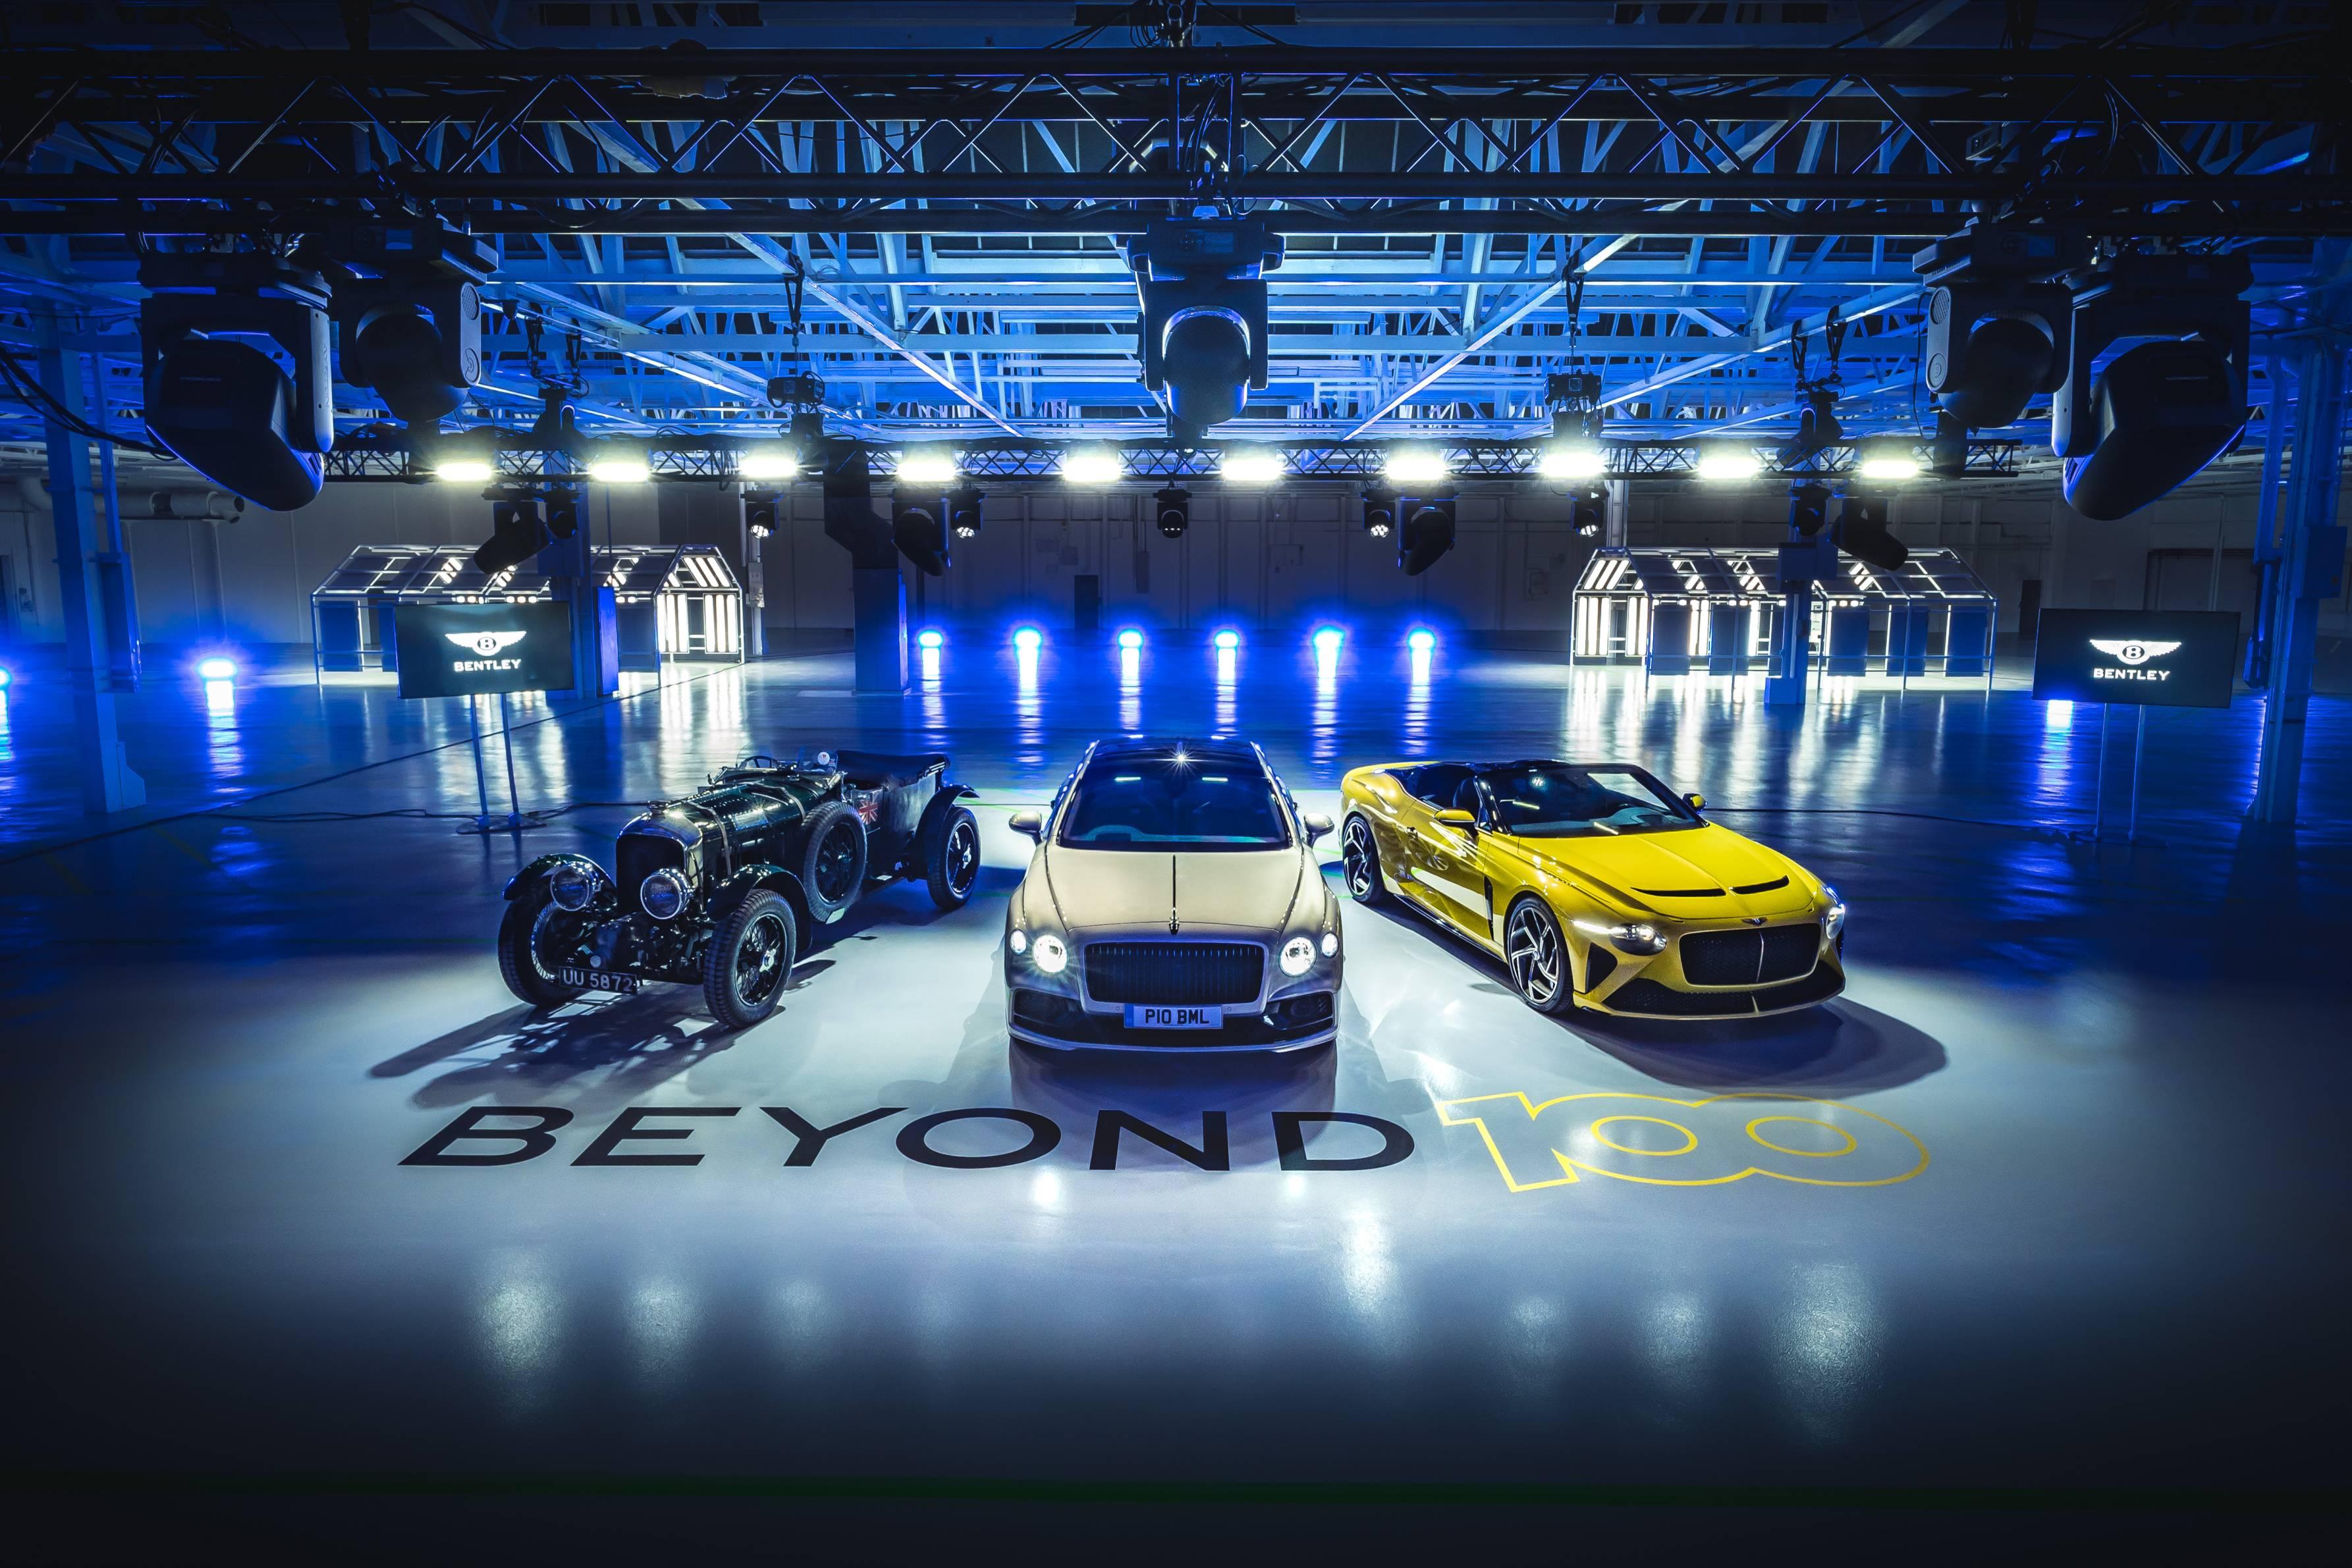 Bentley motors outlines beyond100 strategy, targeting sustainable luxury mobility leadership